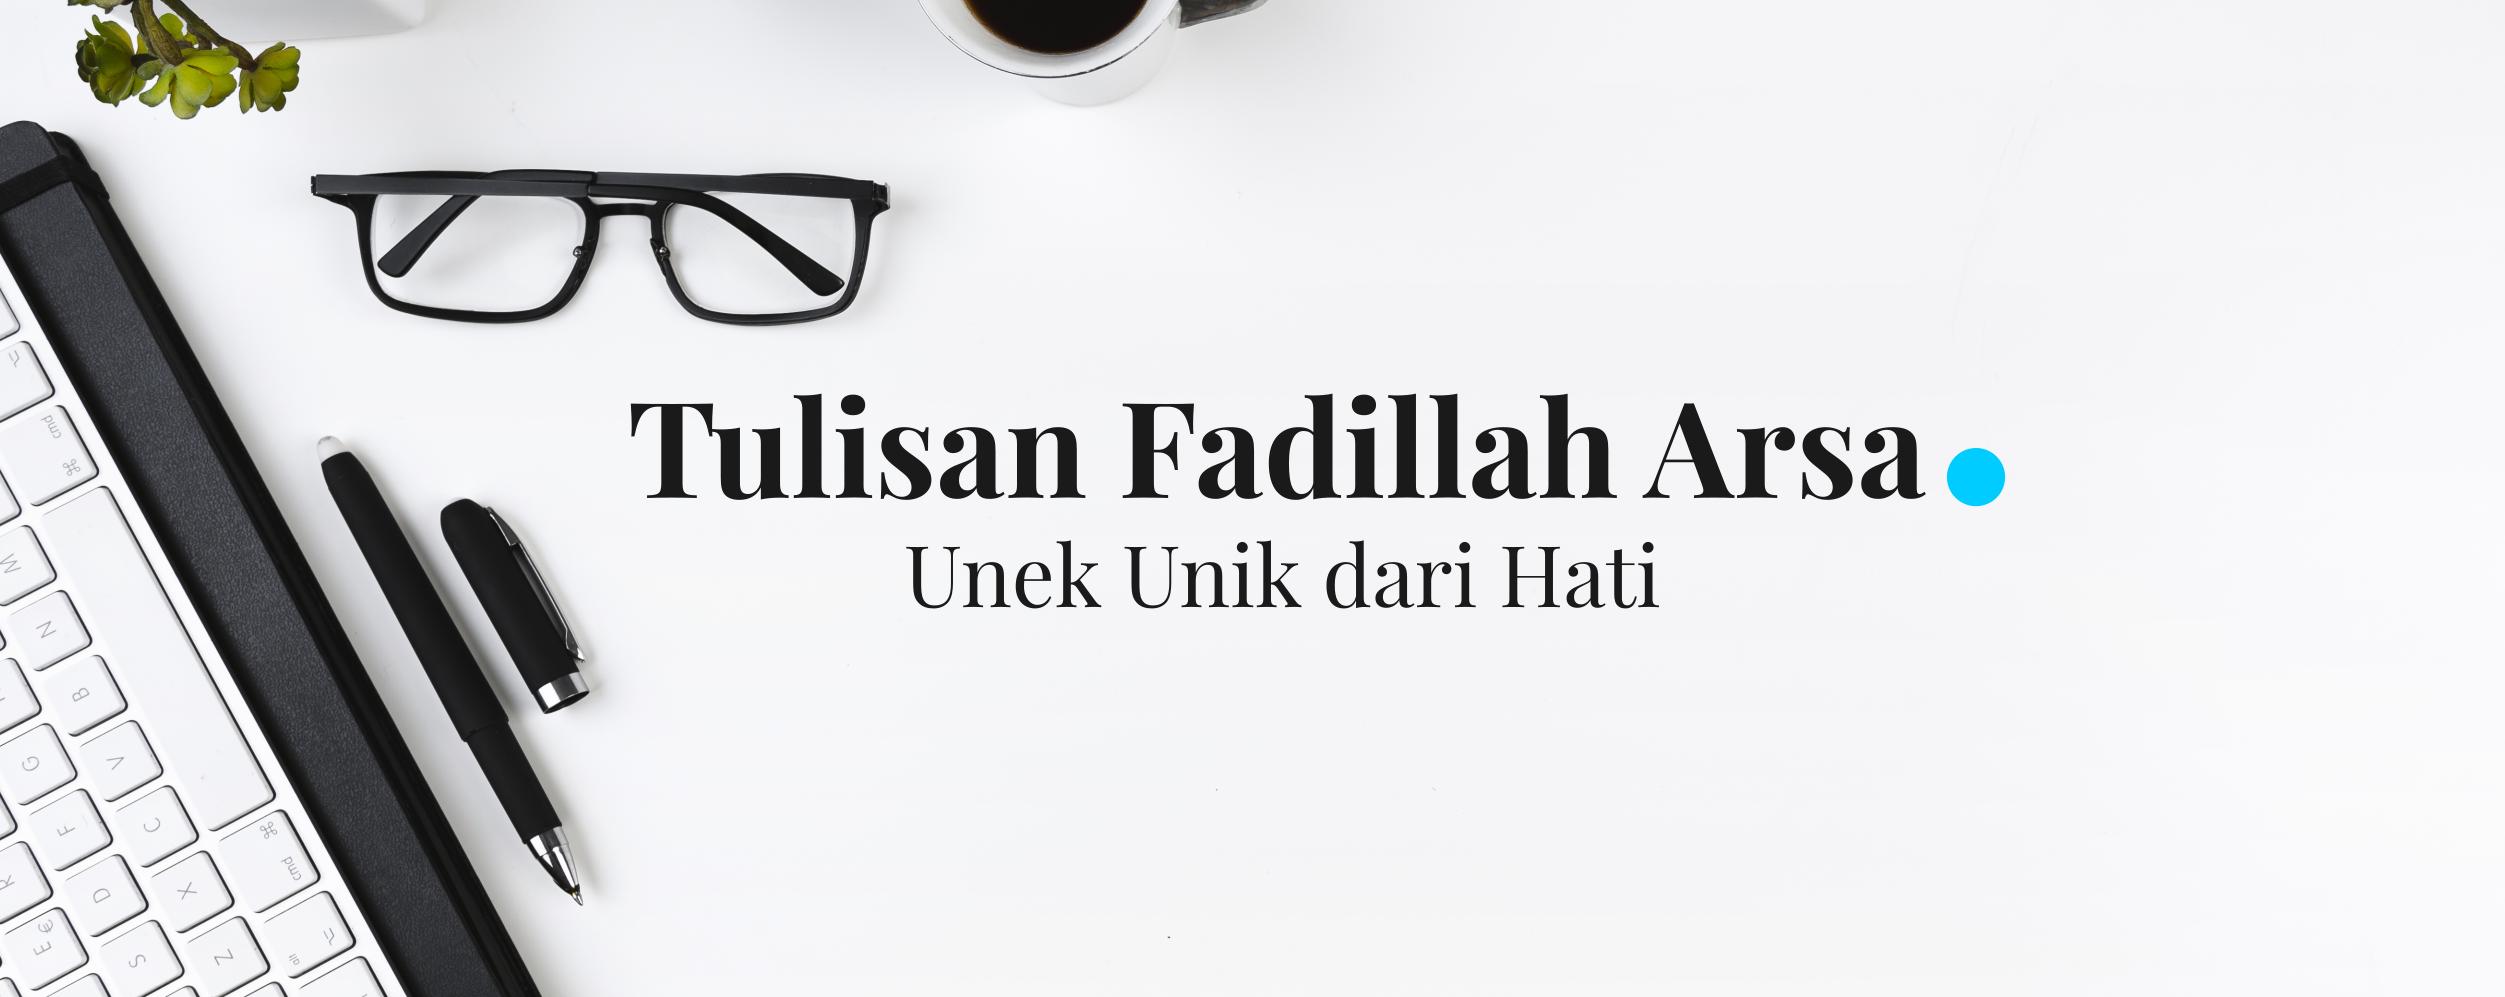 Tulisan Fadillah Arsa